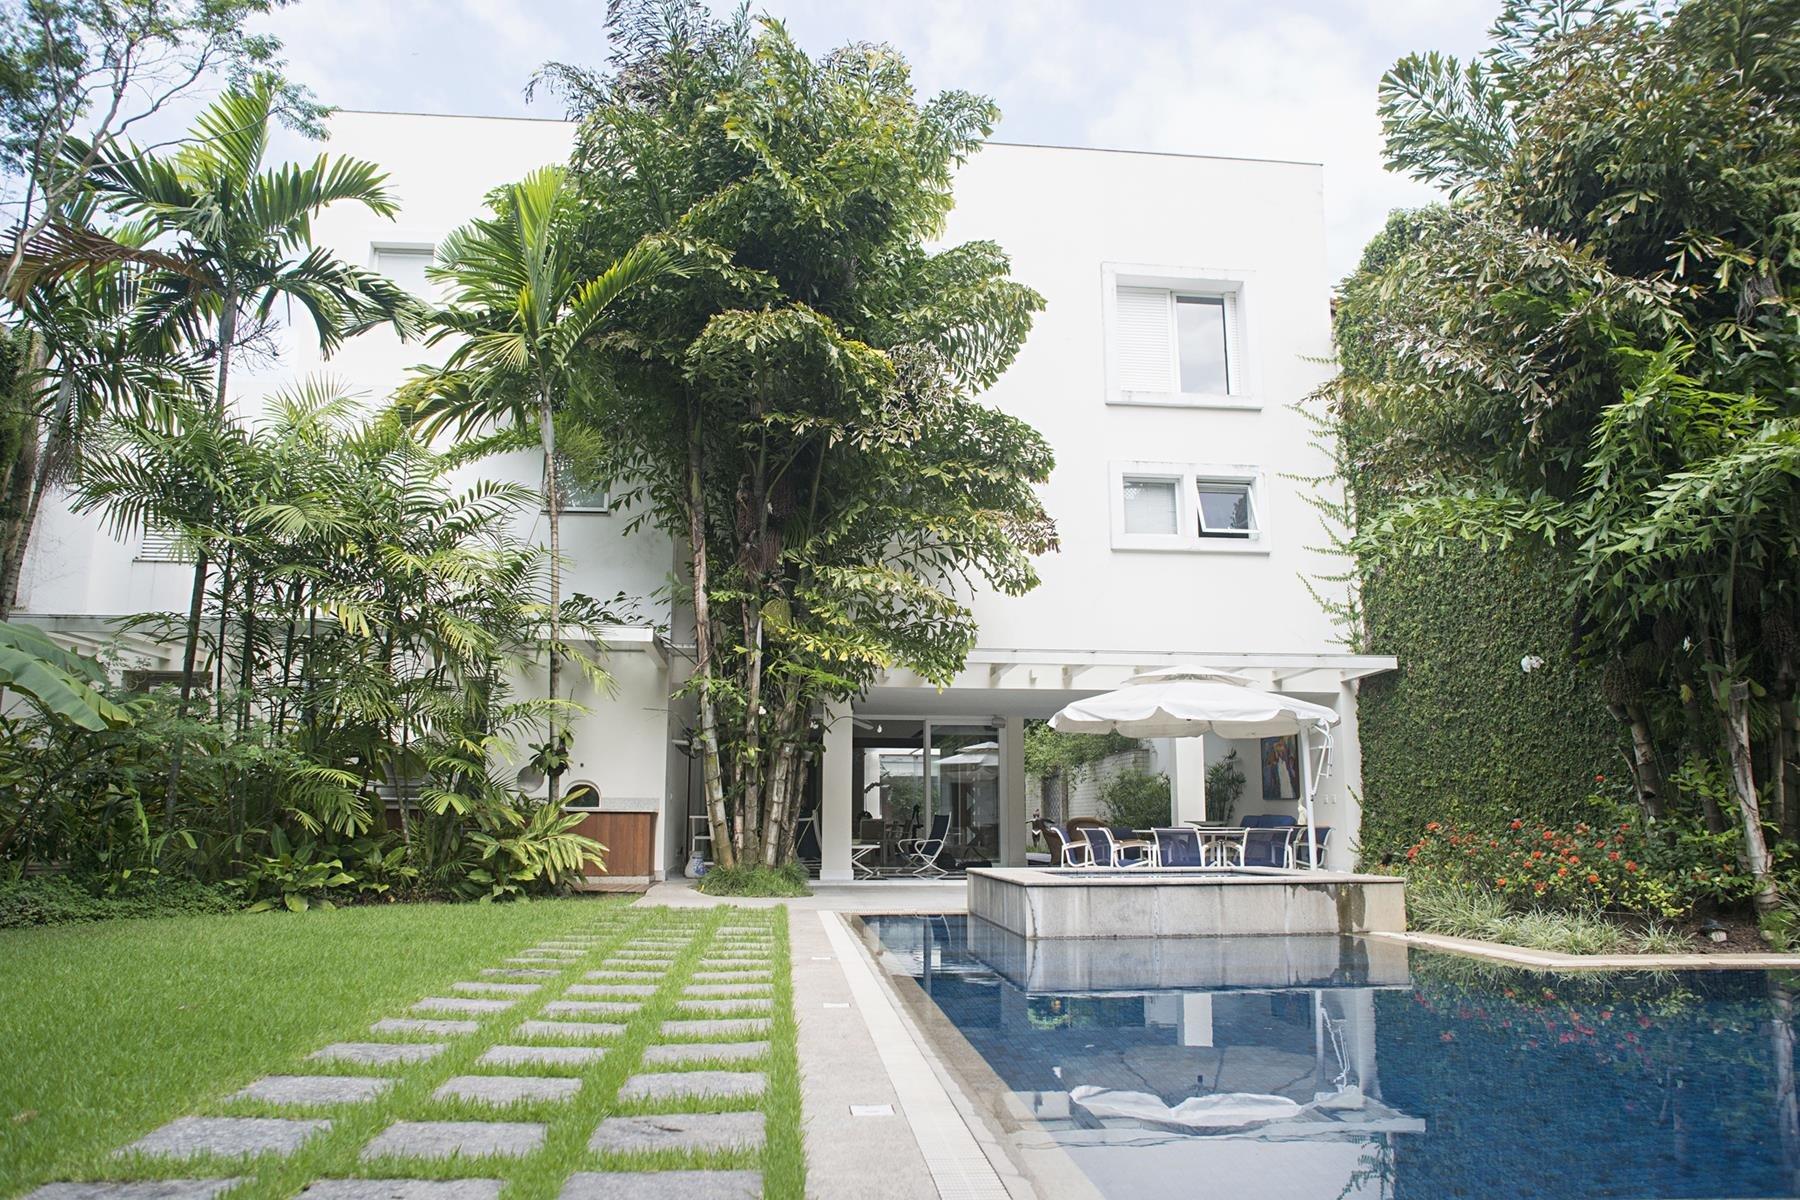 House in State of Rio de Janeiro, Brazil 1